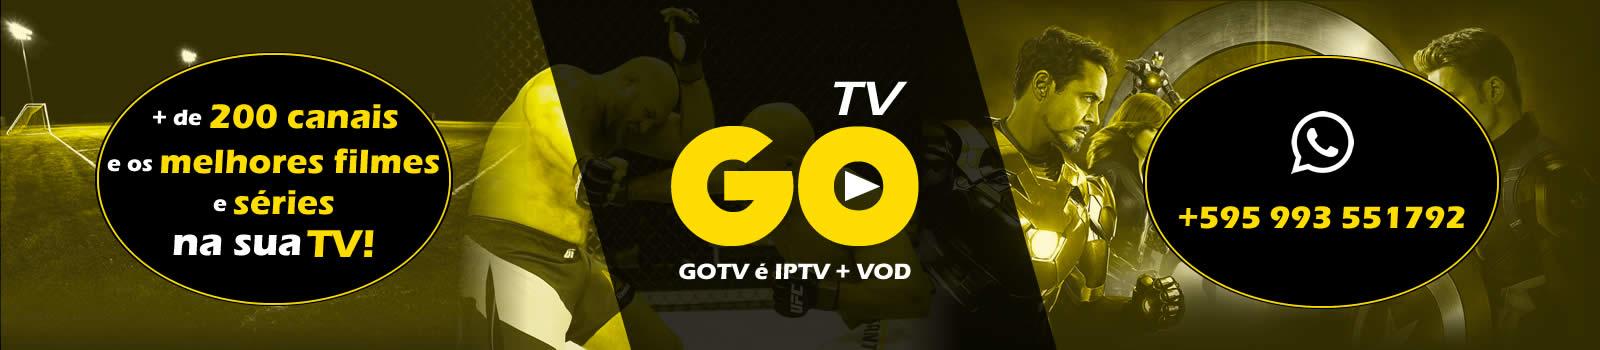 Go TV